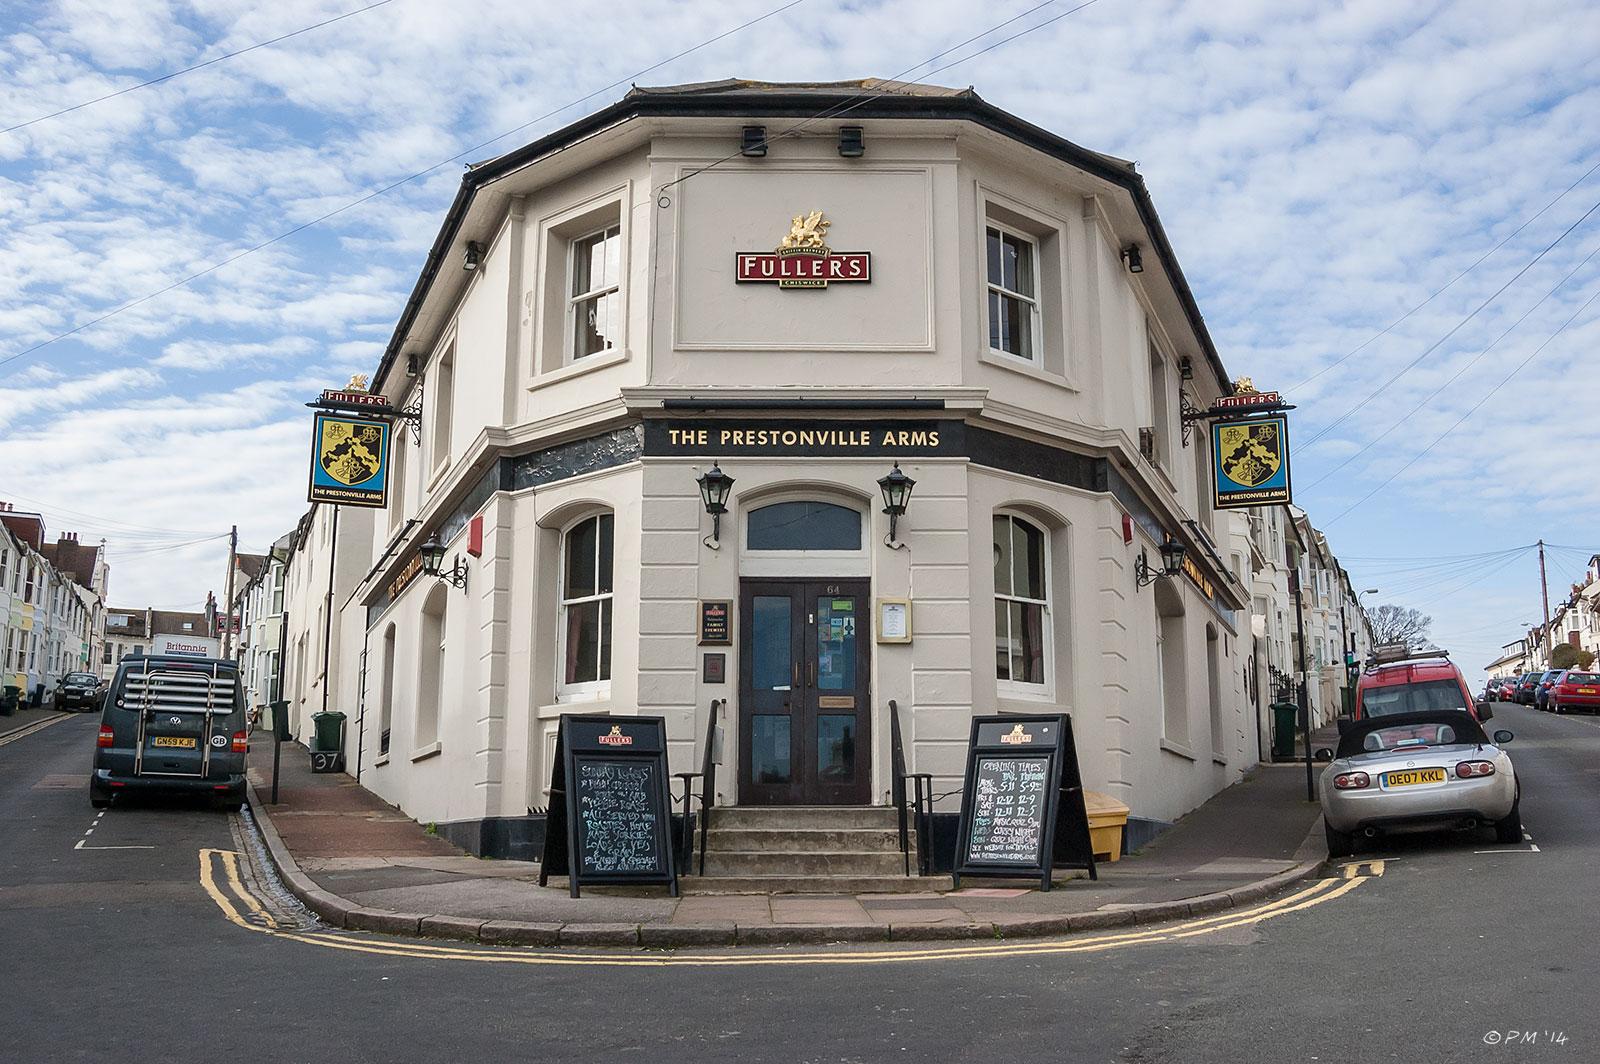 Prestonville Arms in Brighton, Gastro Pubs Brighton